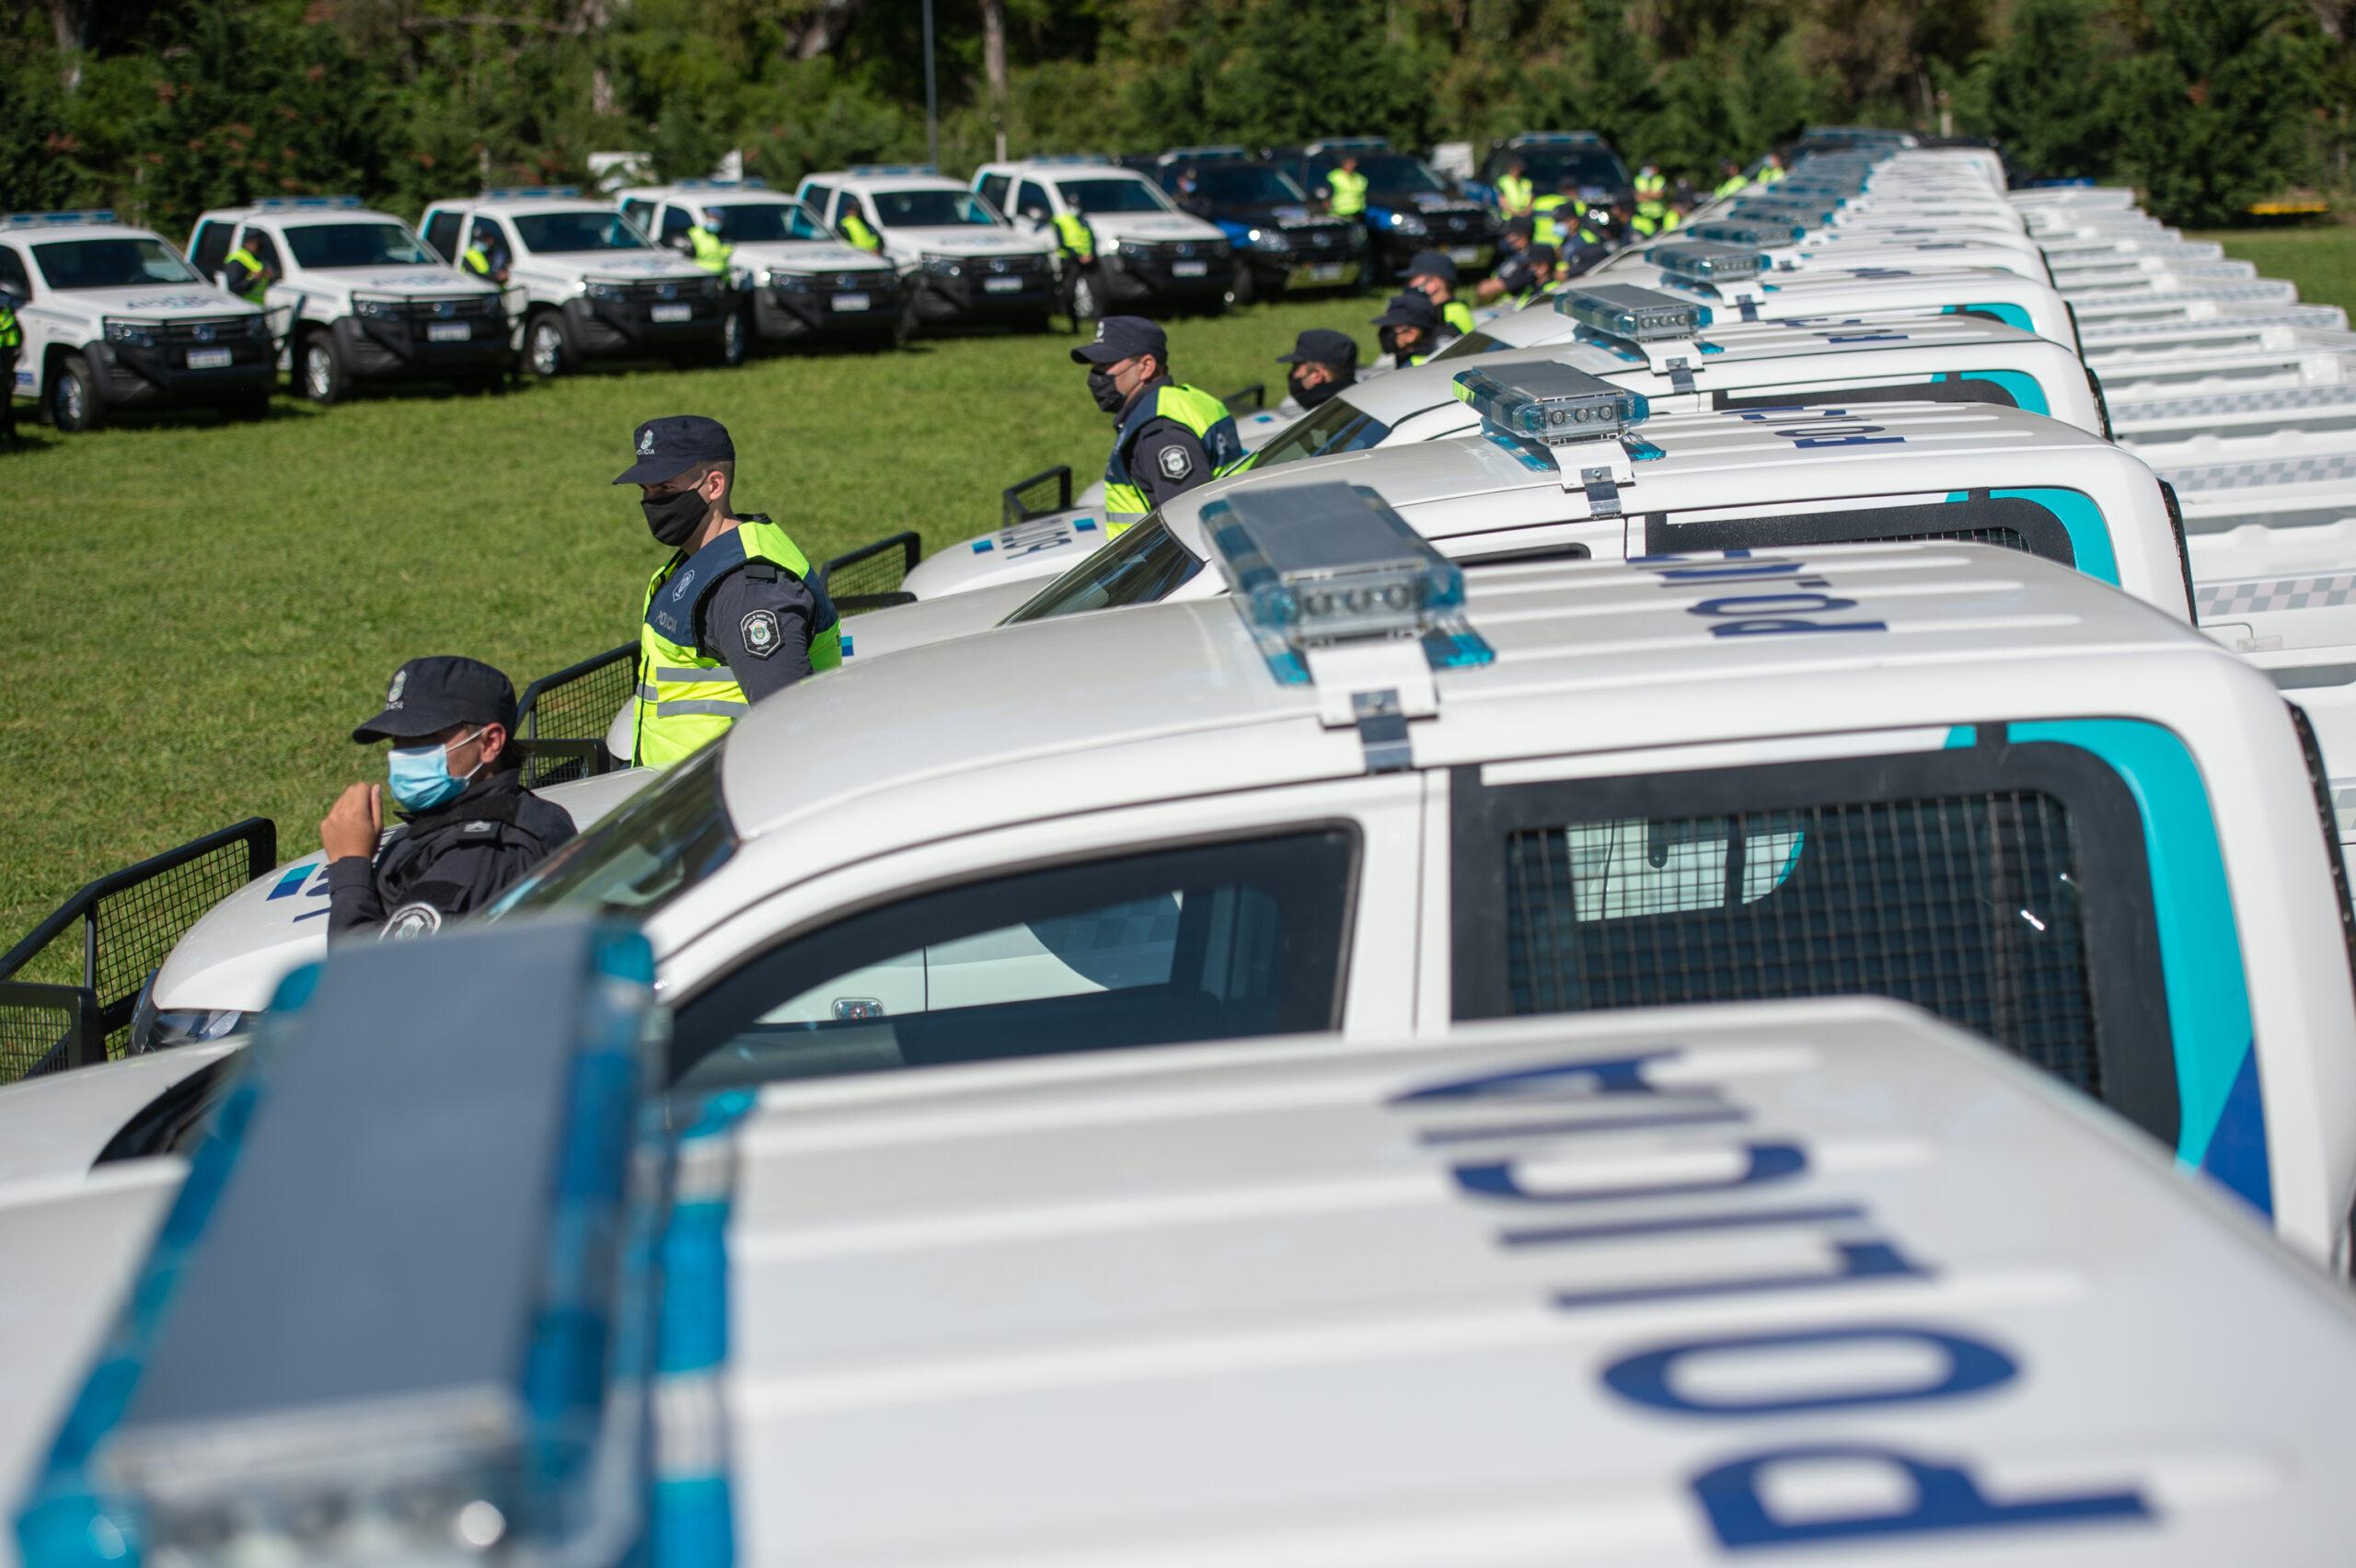 Pilar suma 54 nuevos patrulleros